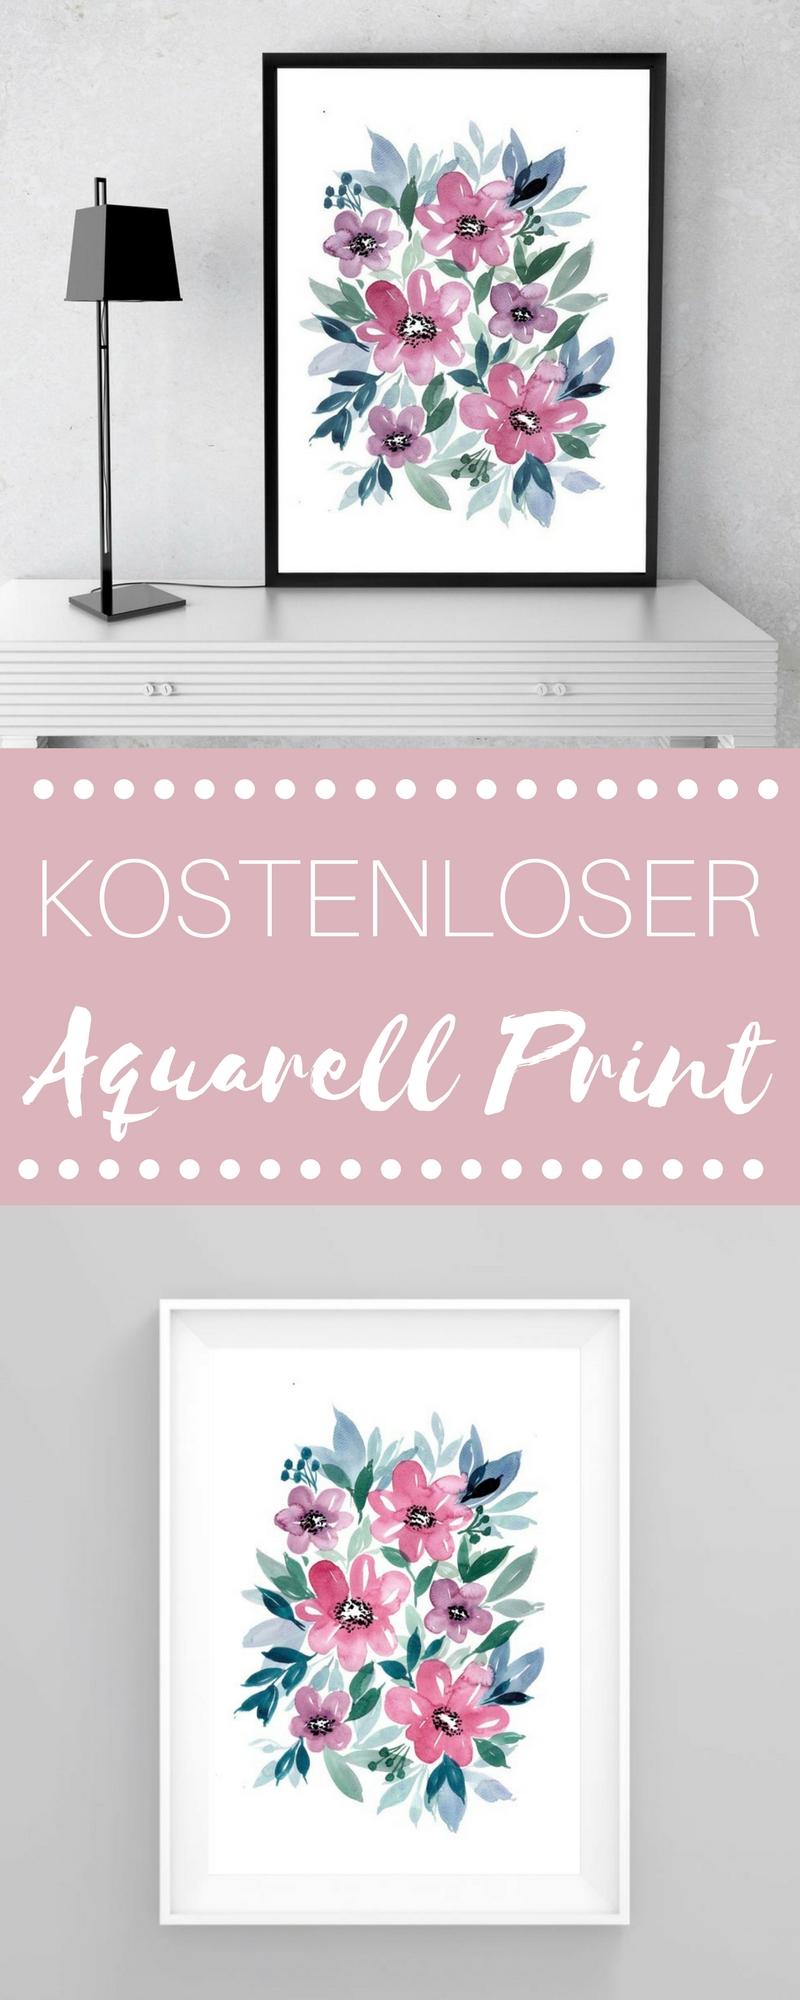 Kostenloser Blumen Aquarell Print